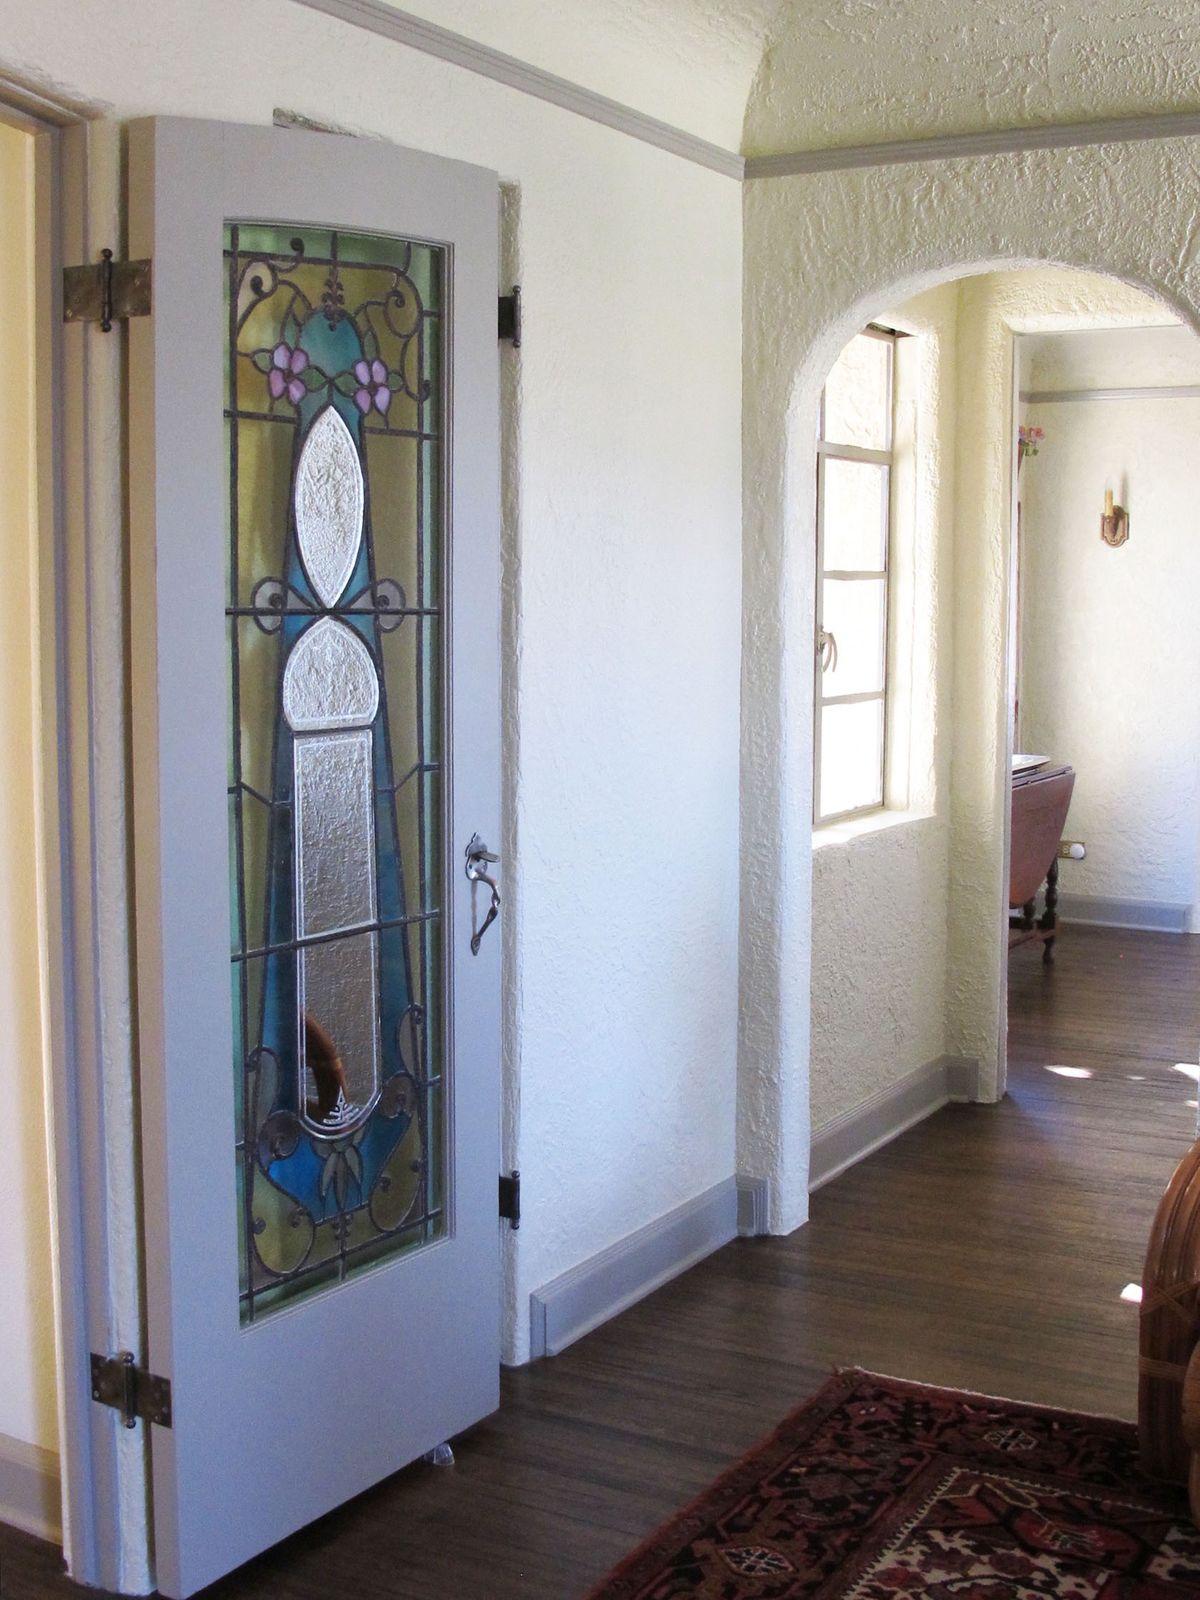 Historic Hutsell Mediterranean Home Photo Video Shoot Location 32.jpg